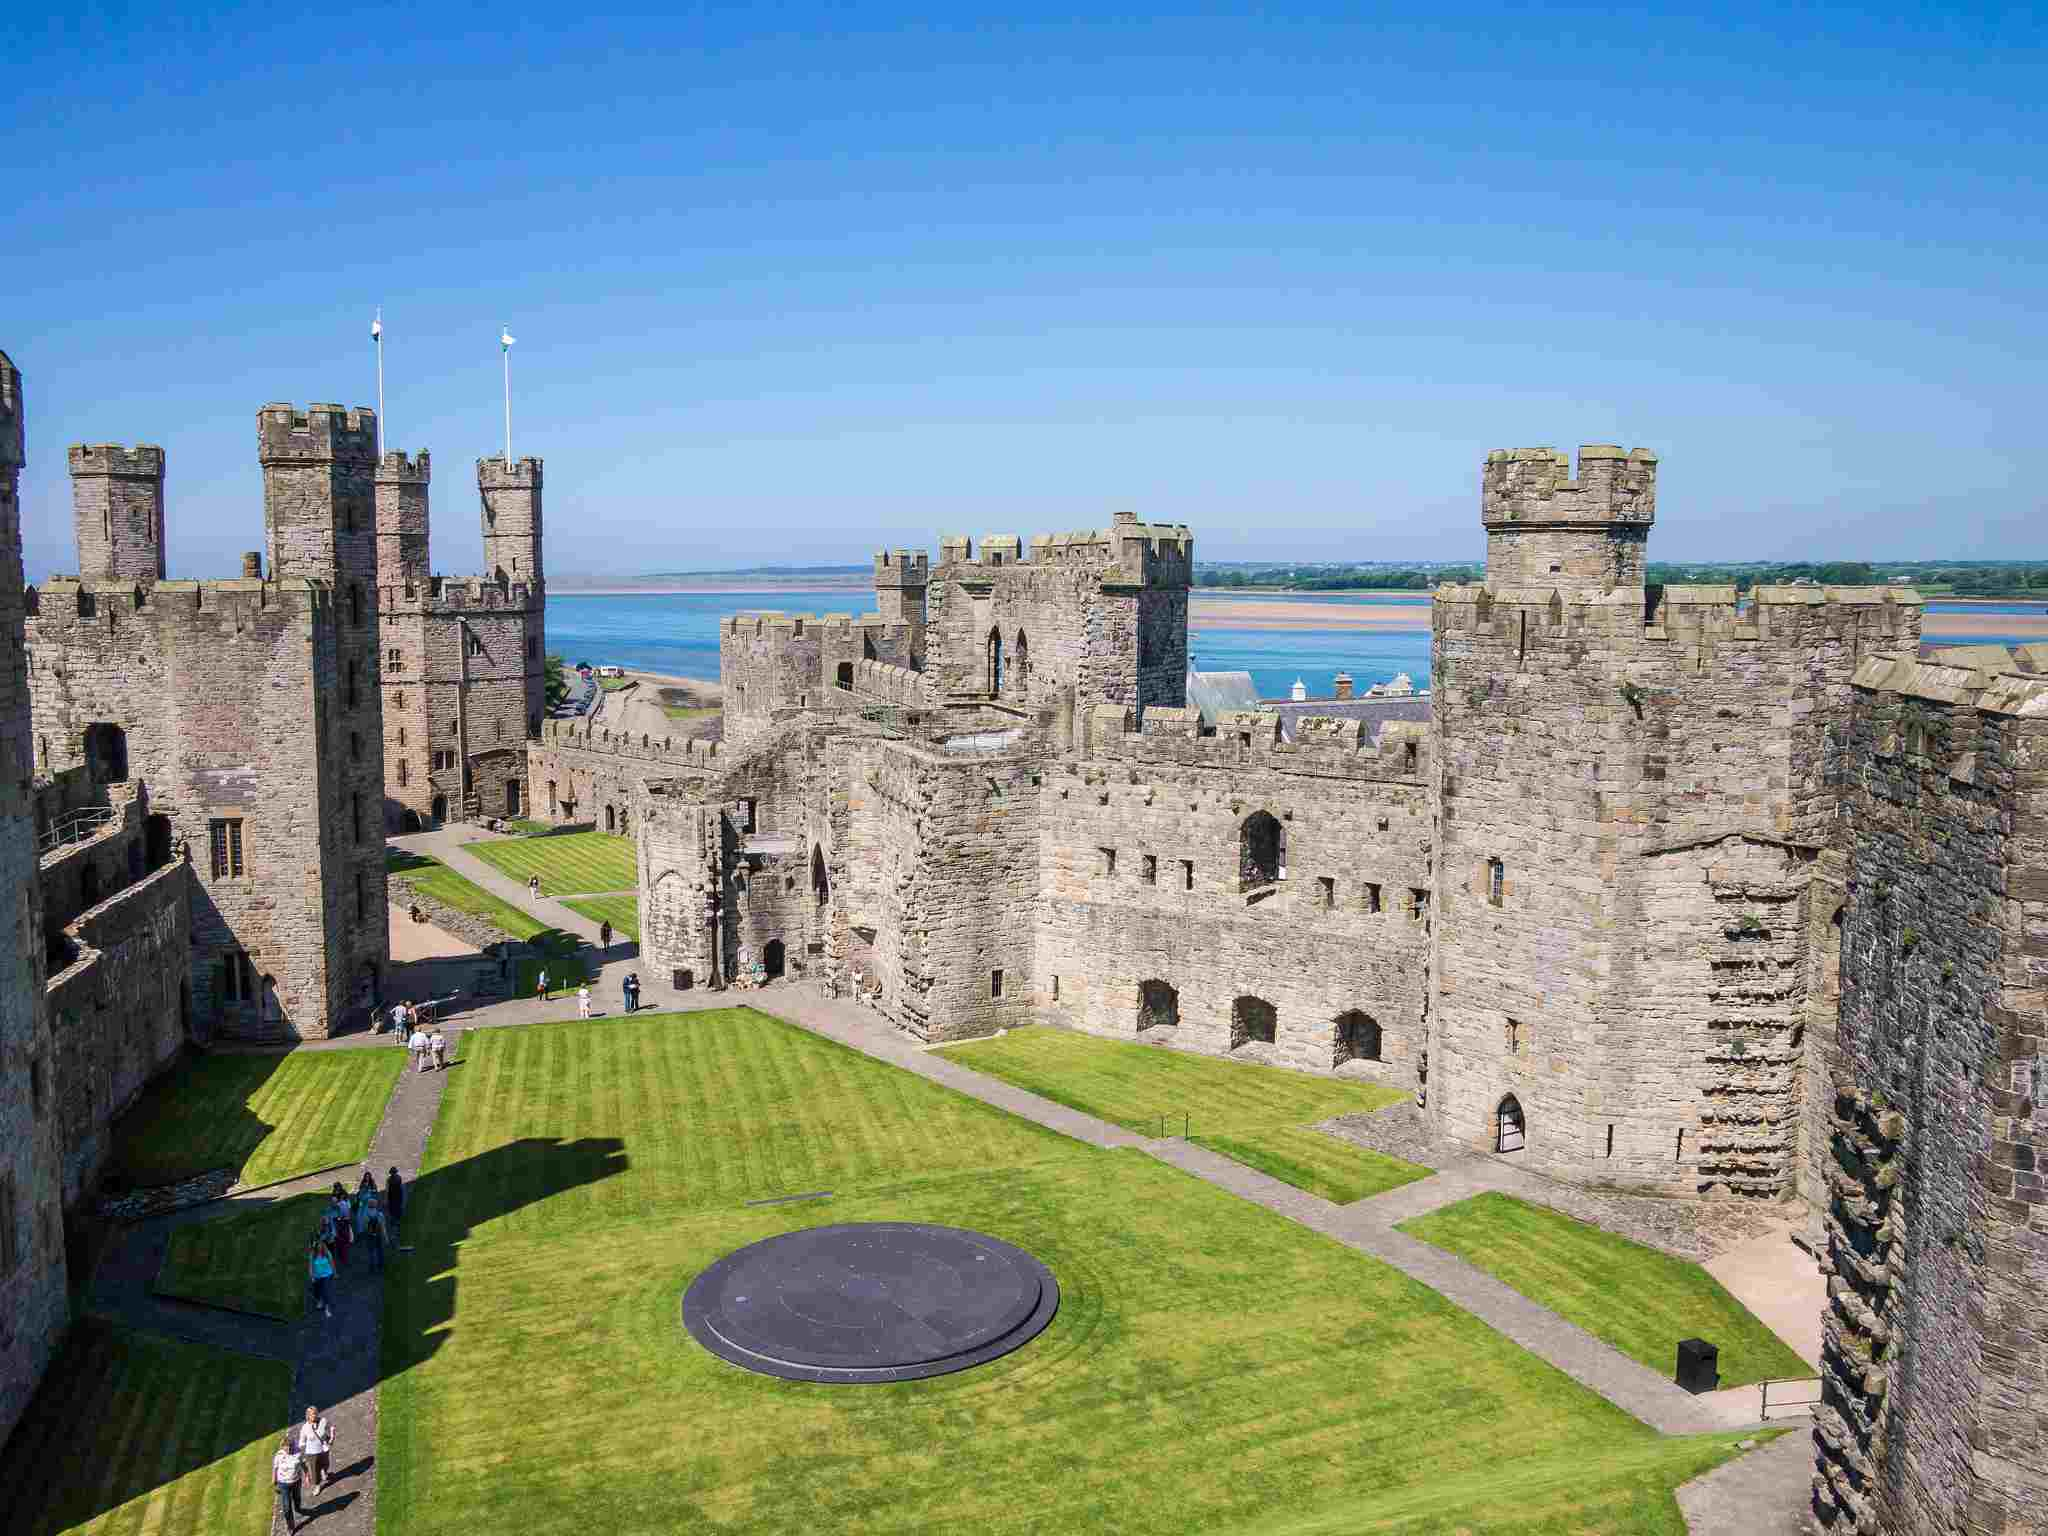 Caernarfon Castle and grounds seen from above